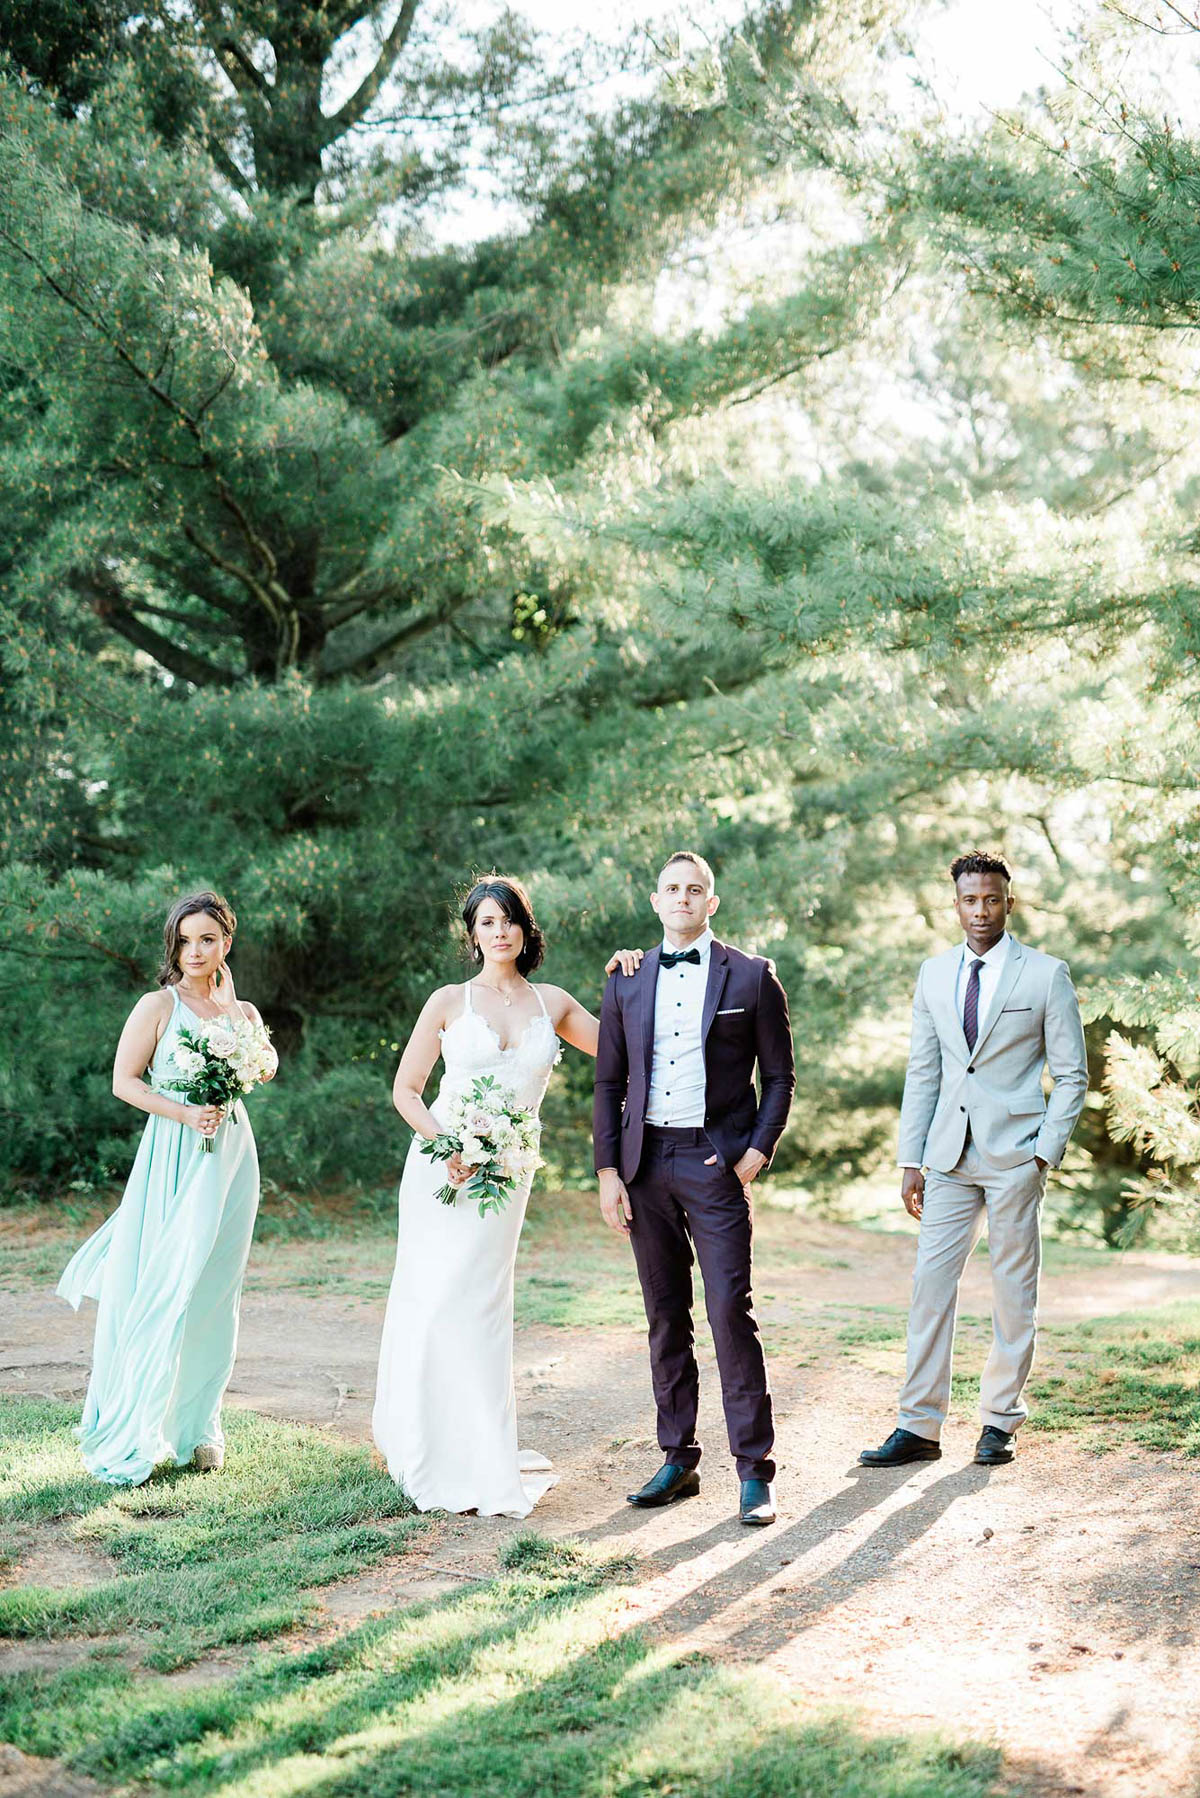 destiny-dawn-photography-vineyard-bride-swish-list-knollwood-golf-and-country-club-ancaster-wedding-editorial-29.jpg